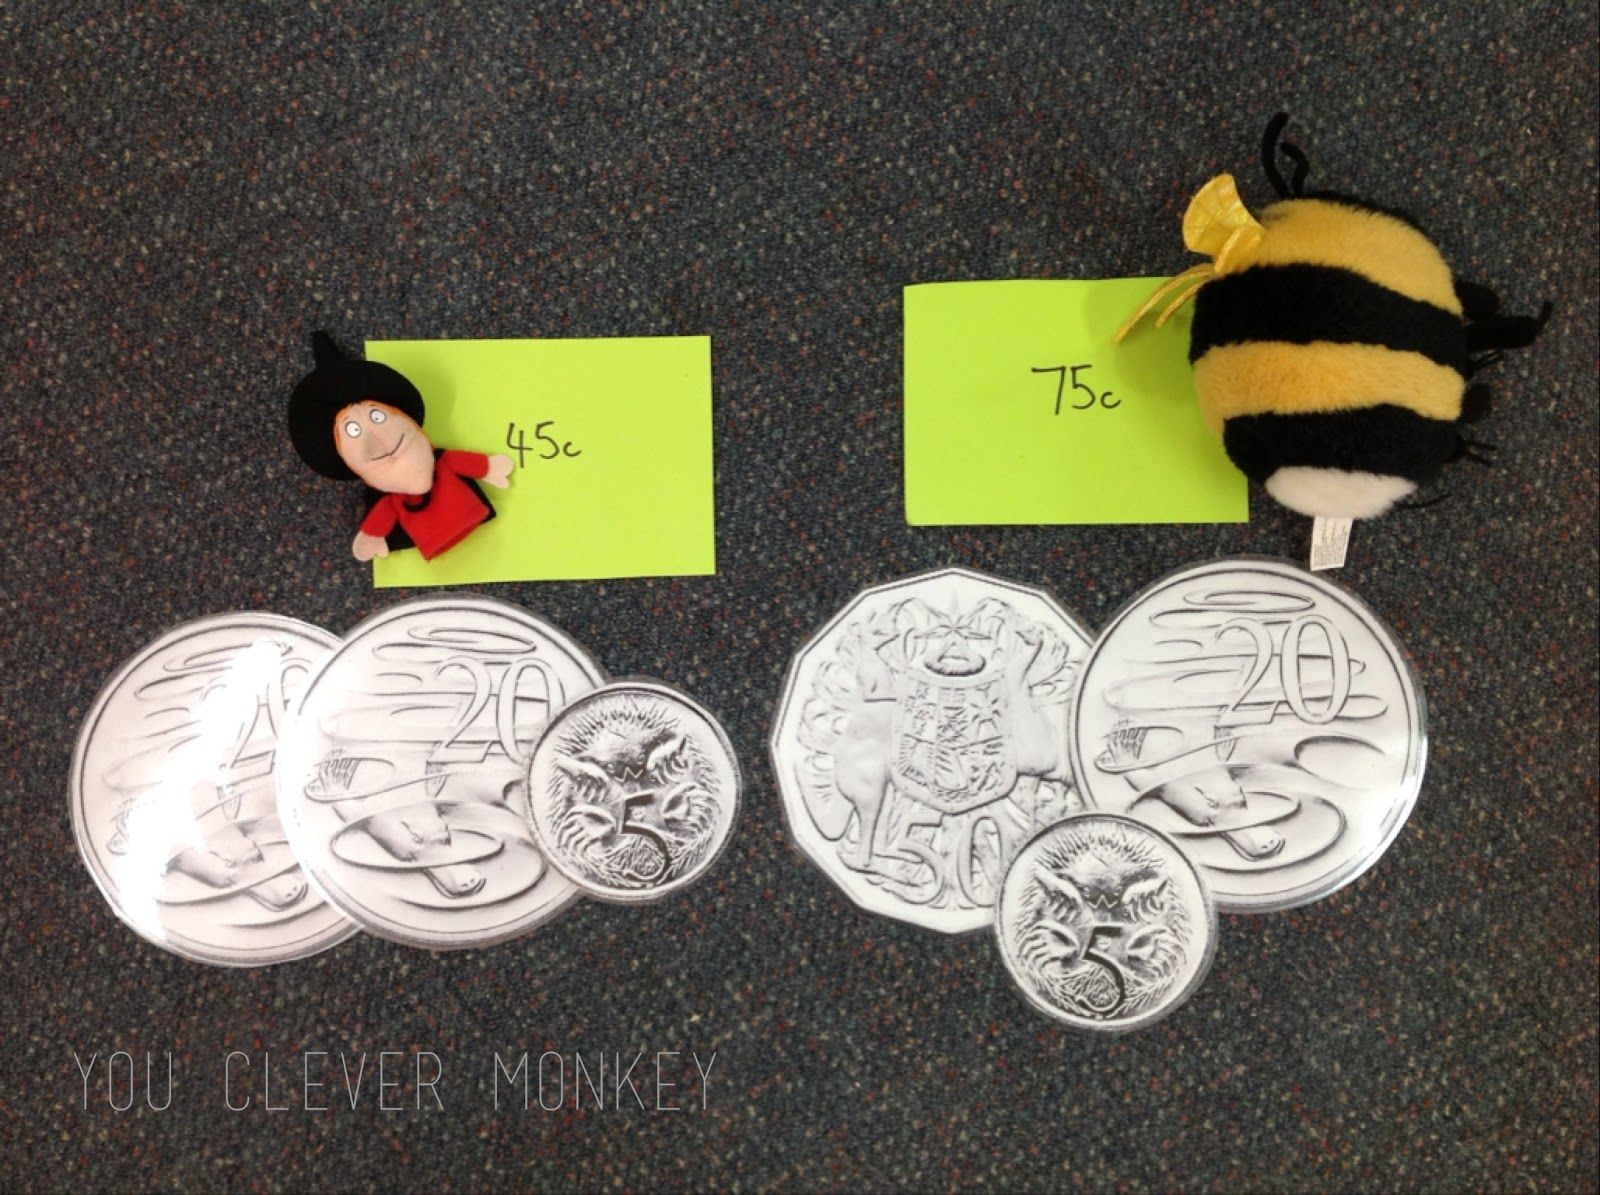 Australian Money Unit Youclevermonkey